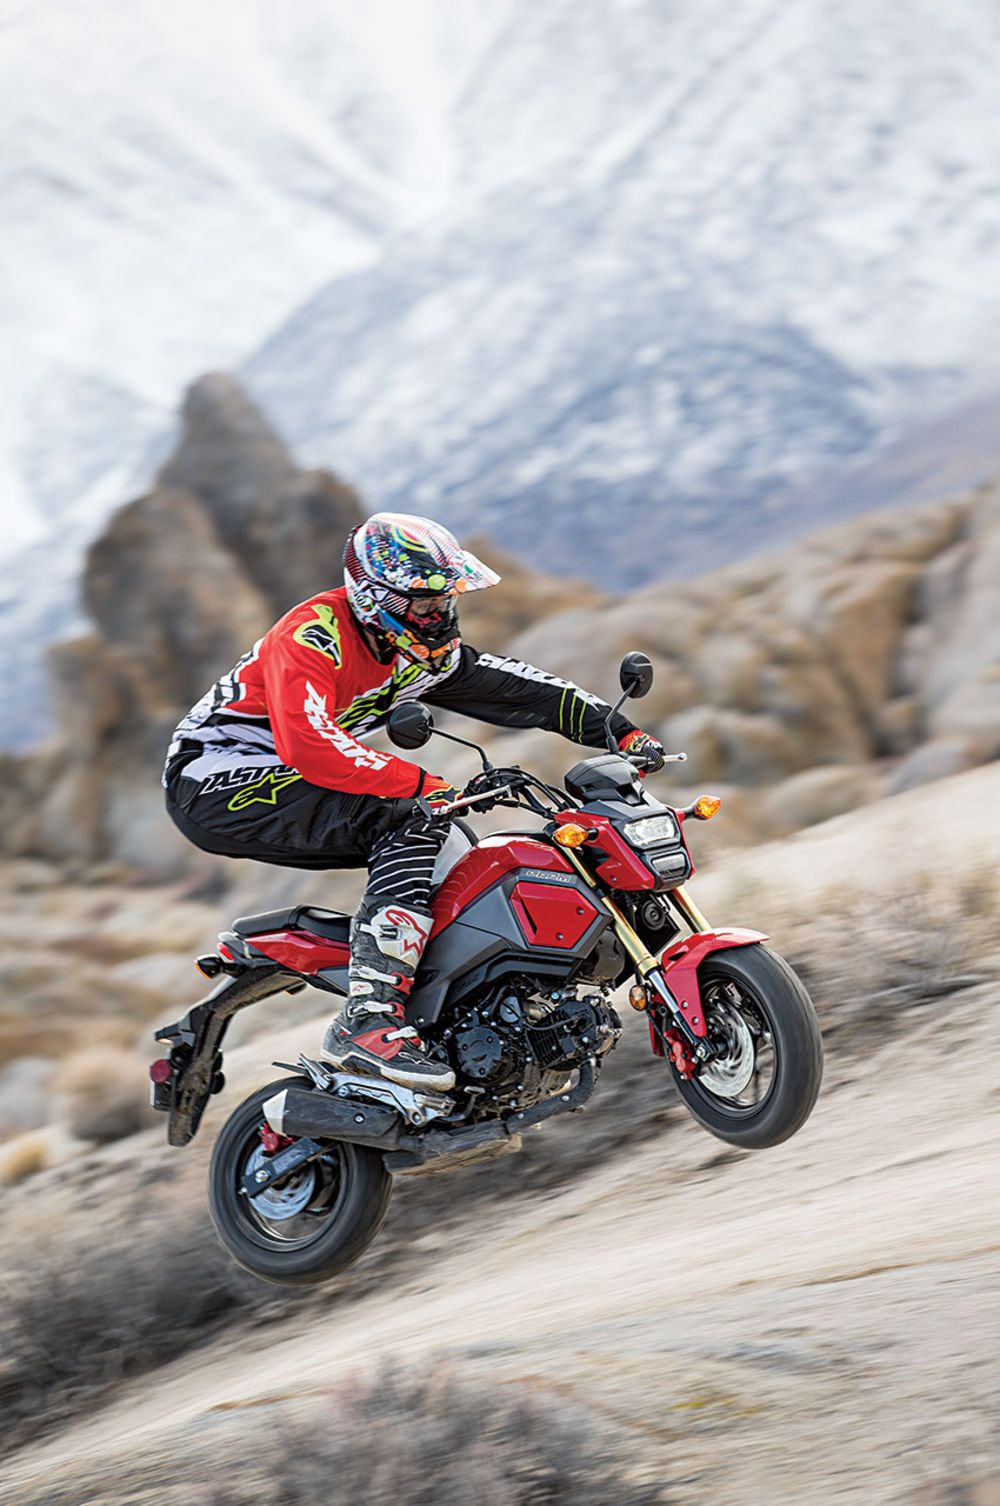 Honda Grom off-road dirt action   Moto - All - Sorts ...